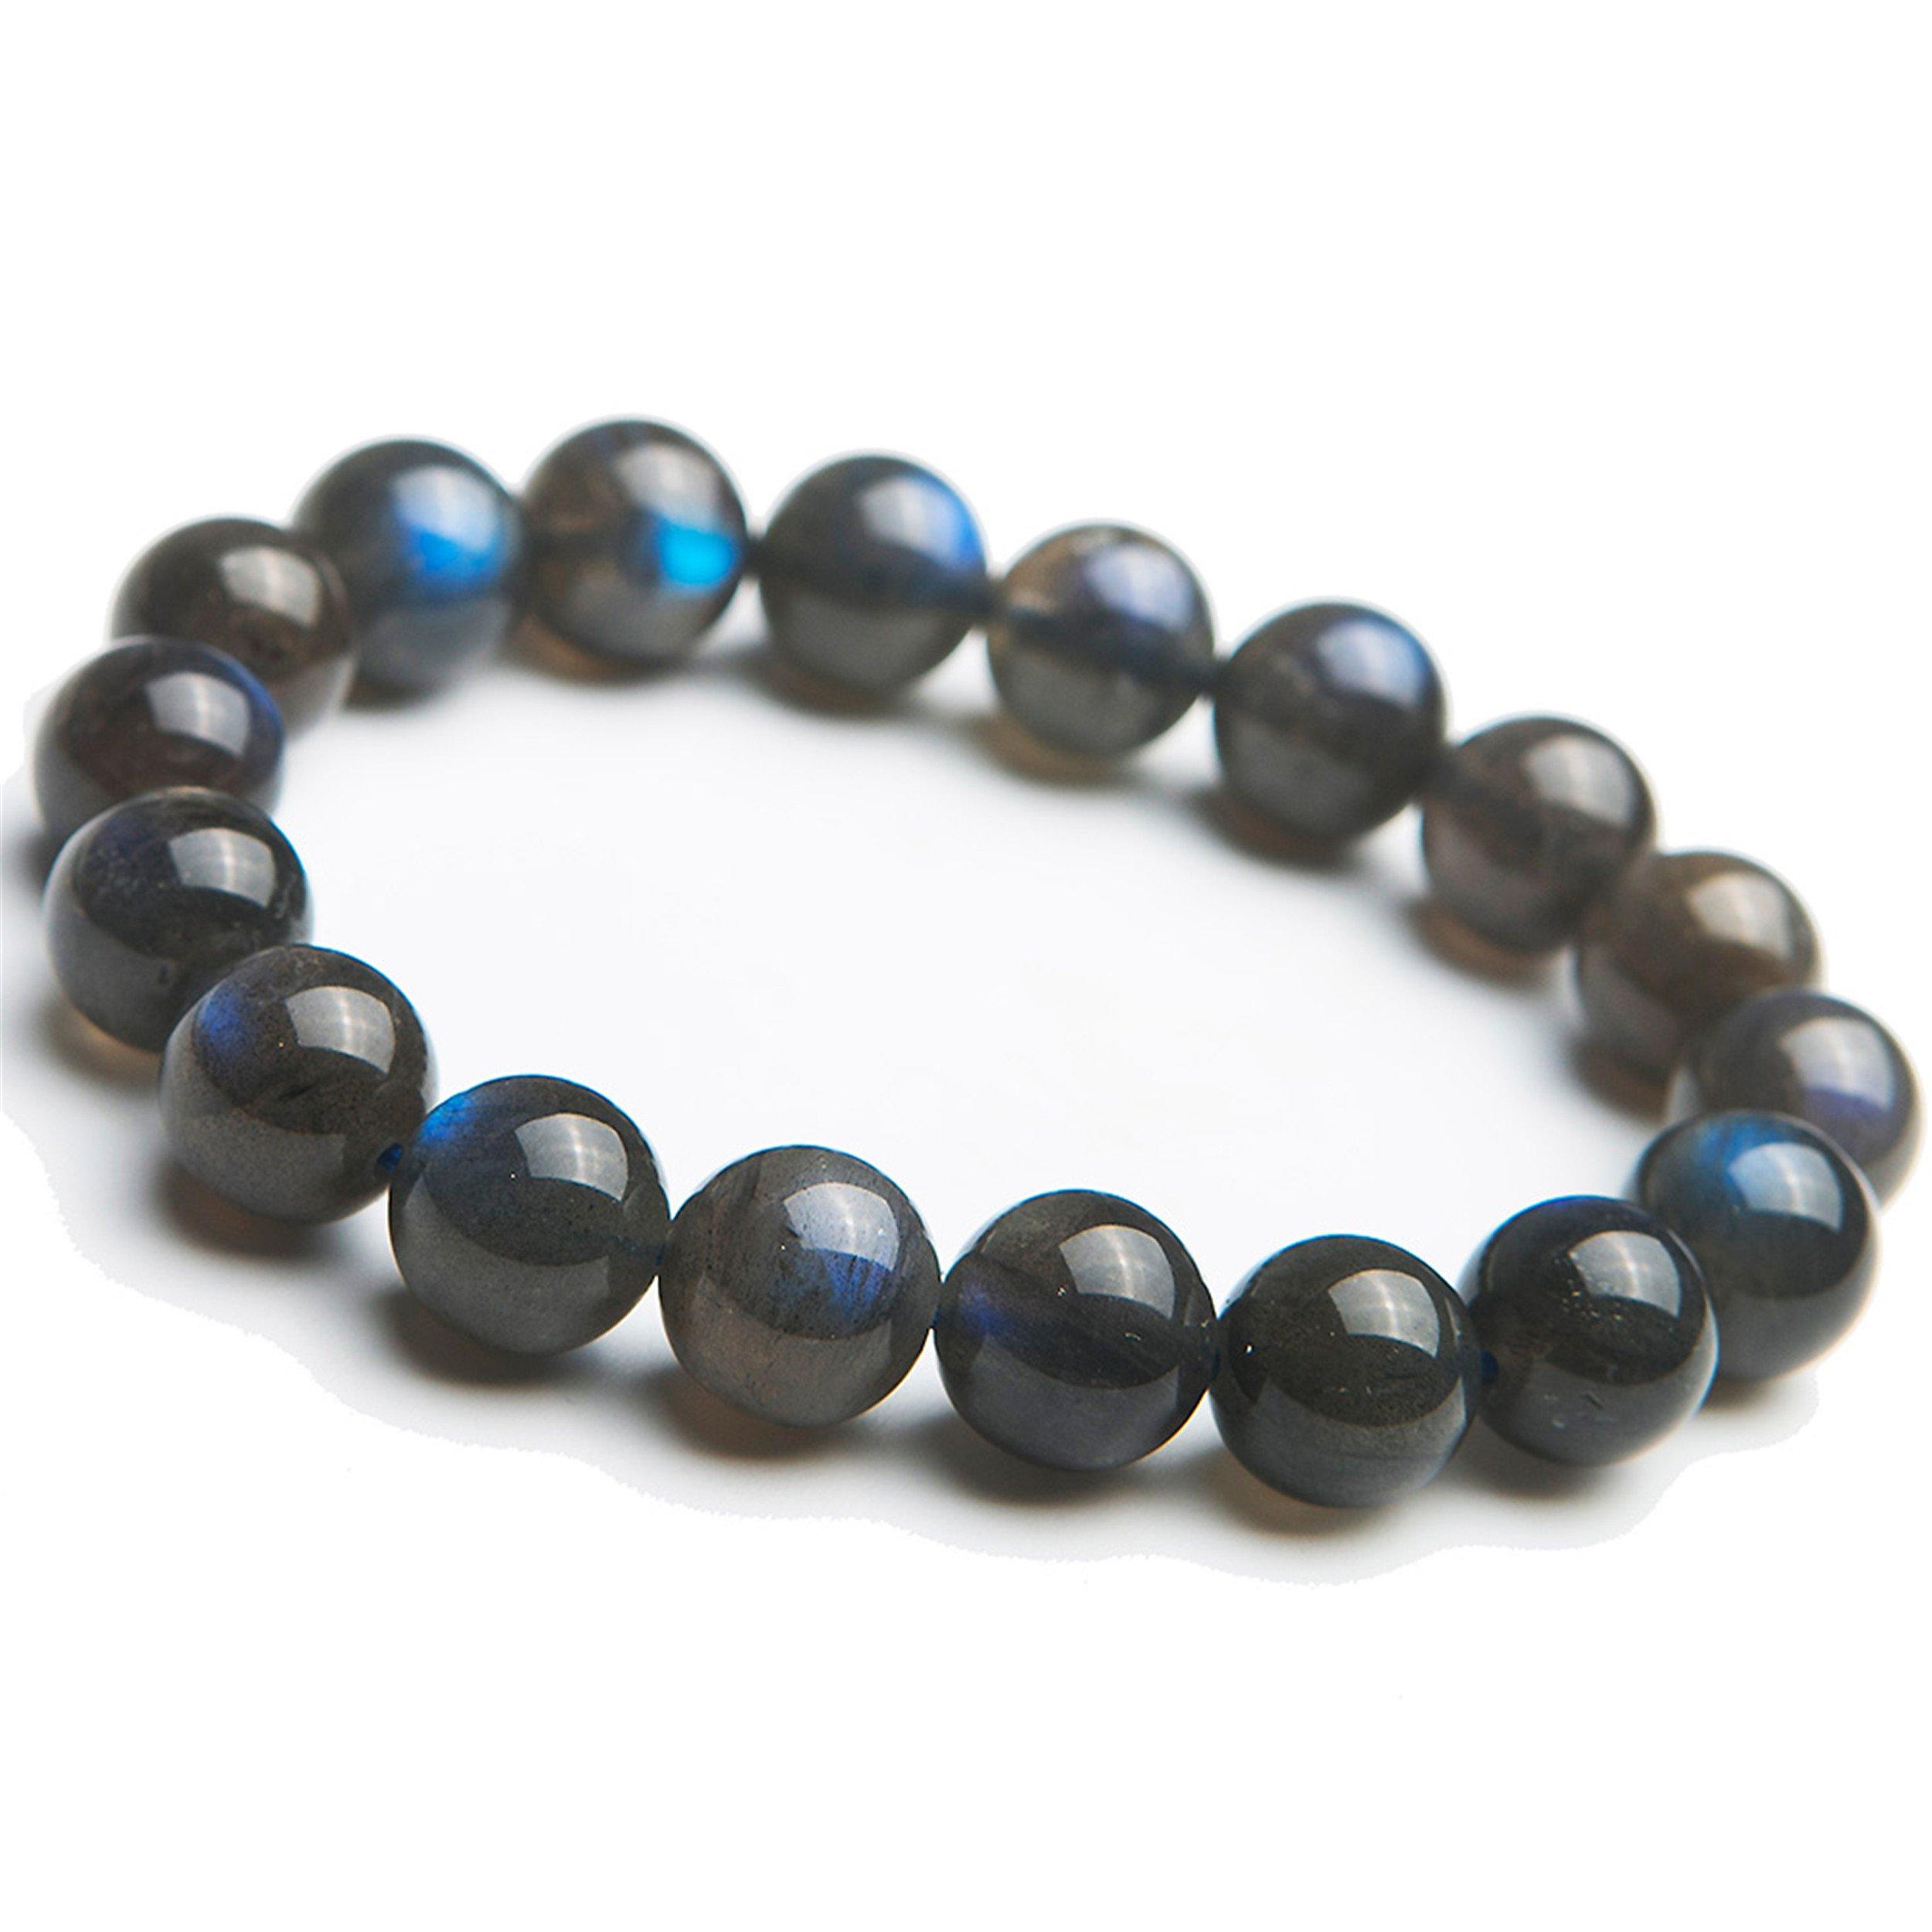 12mm Natural Genuine Labradorite Gemstone Blue Crystal Stretch Round Bead Bracelet AAAA